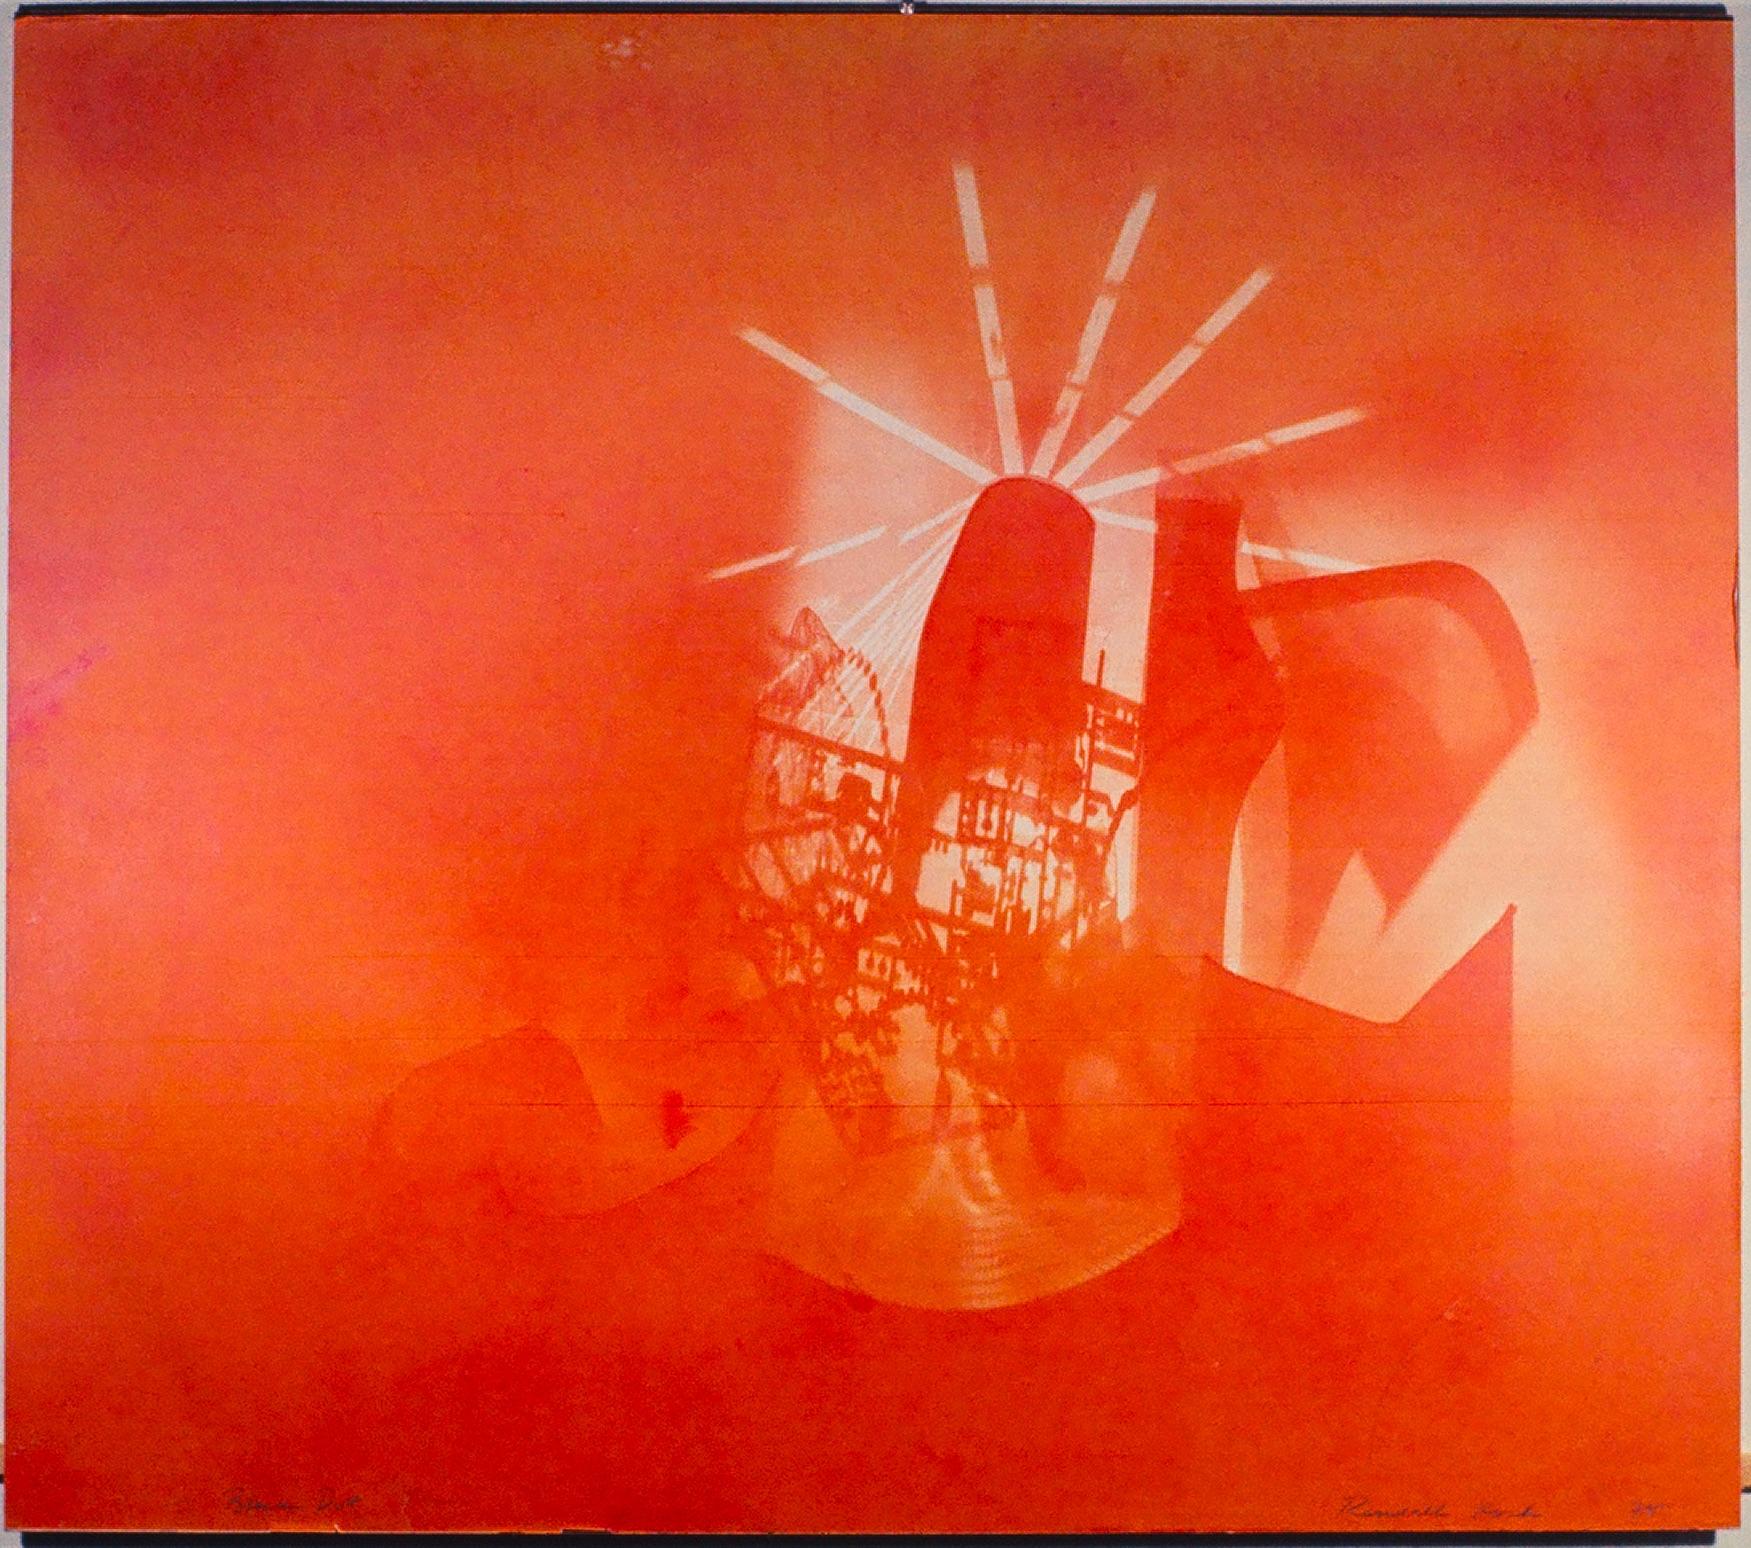 Red Alert 1975